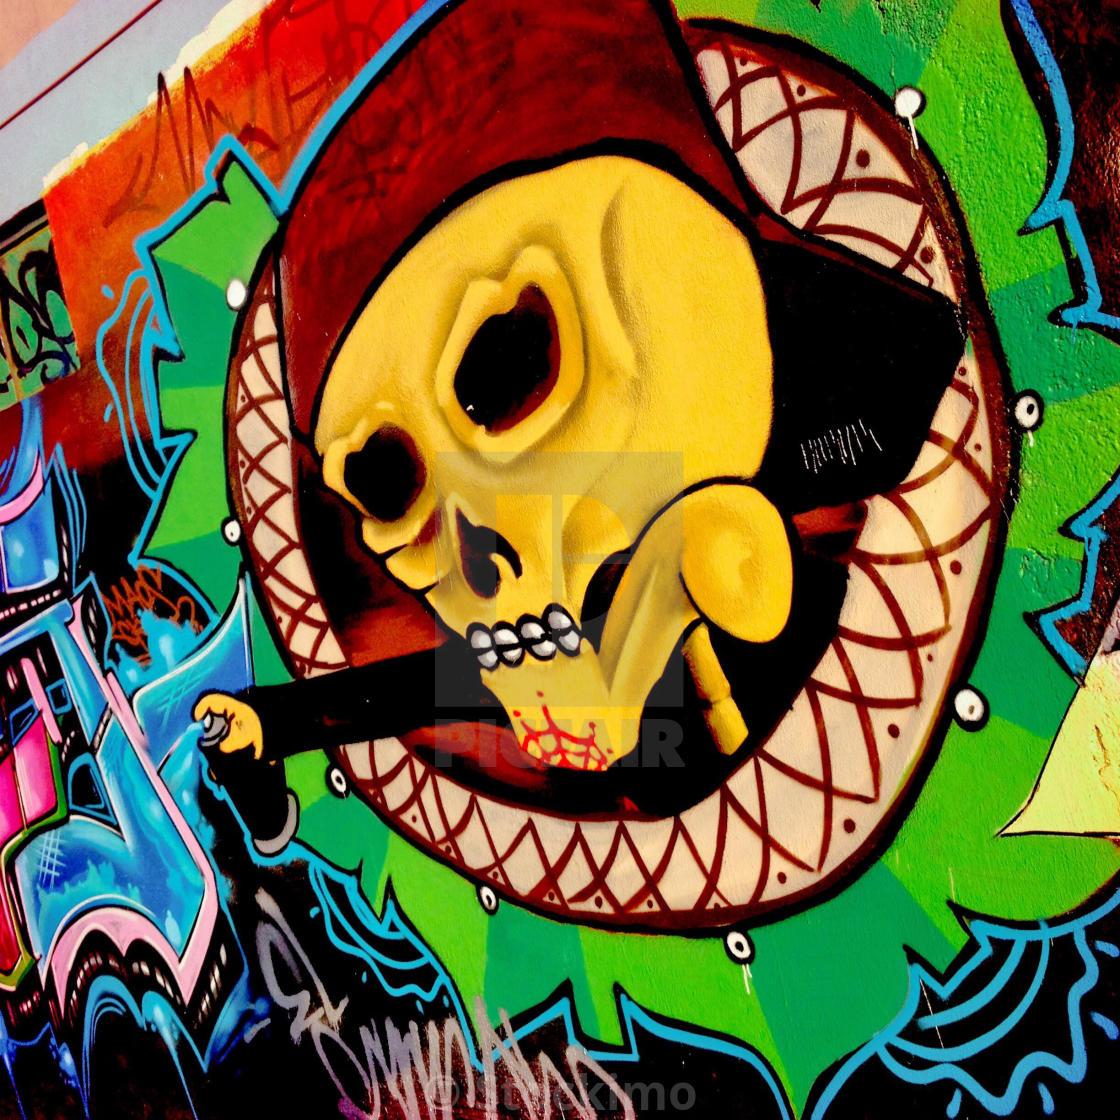 A skull graffiti artwork, illustrating the extensive Death worship ...